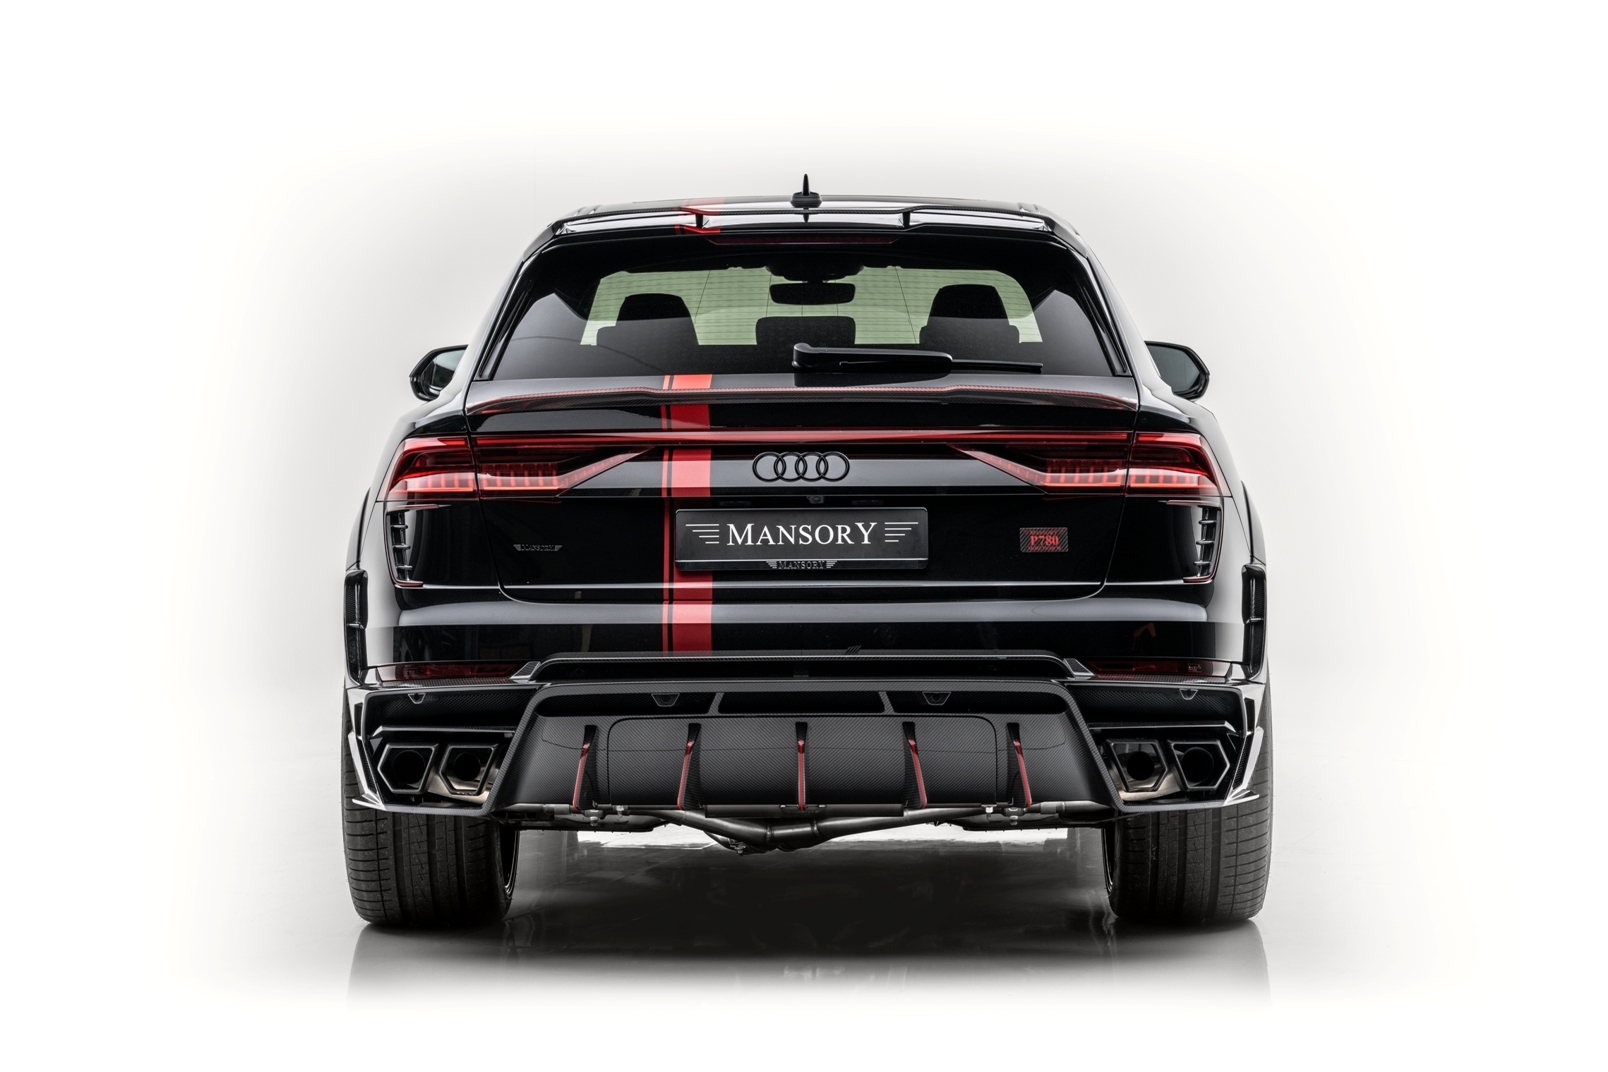 Mansory Audi Rsq8 (4)